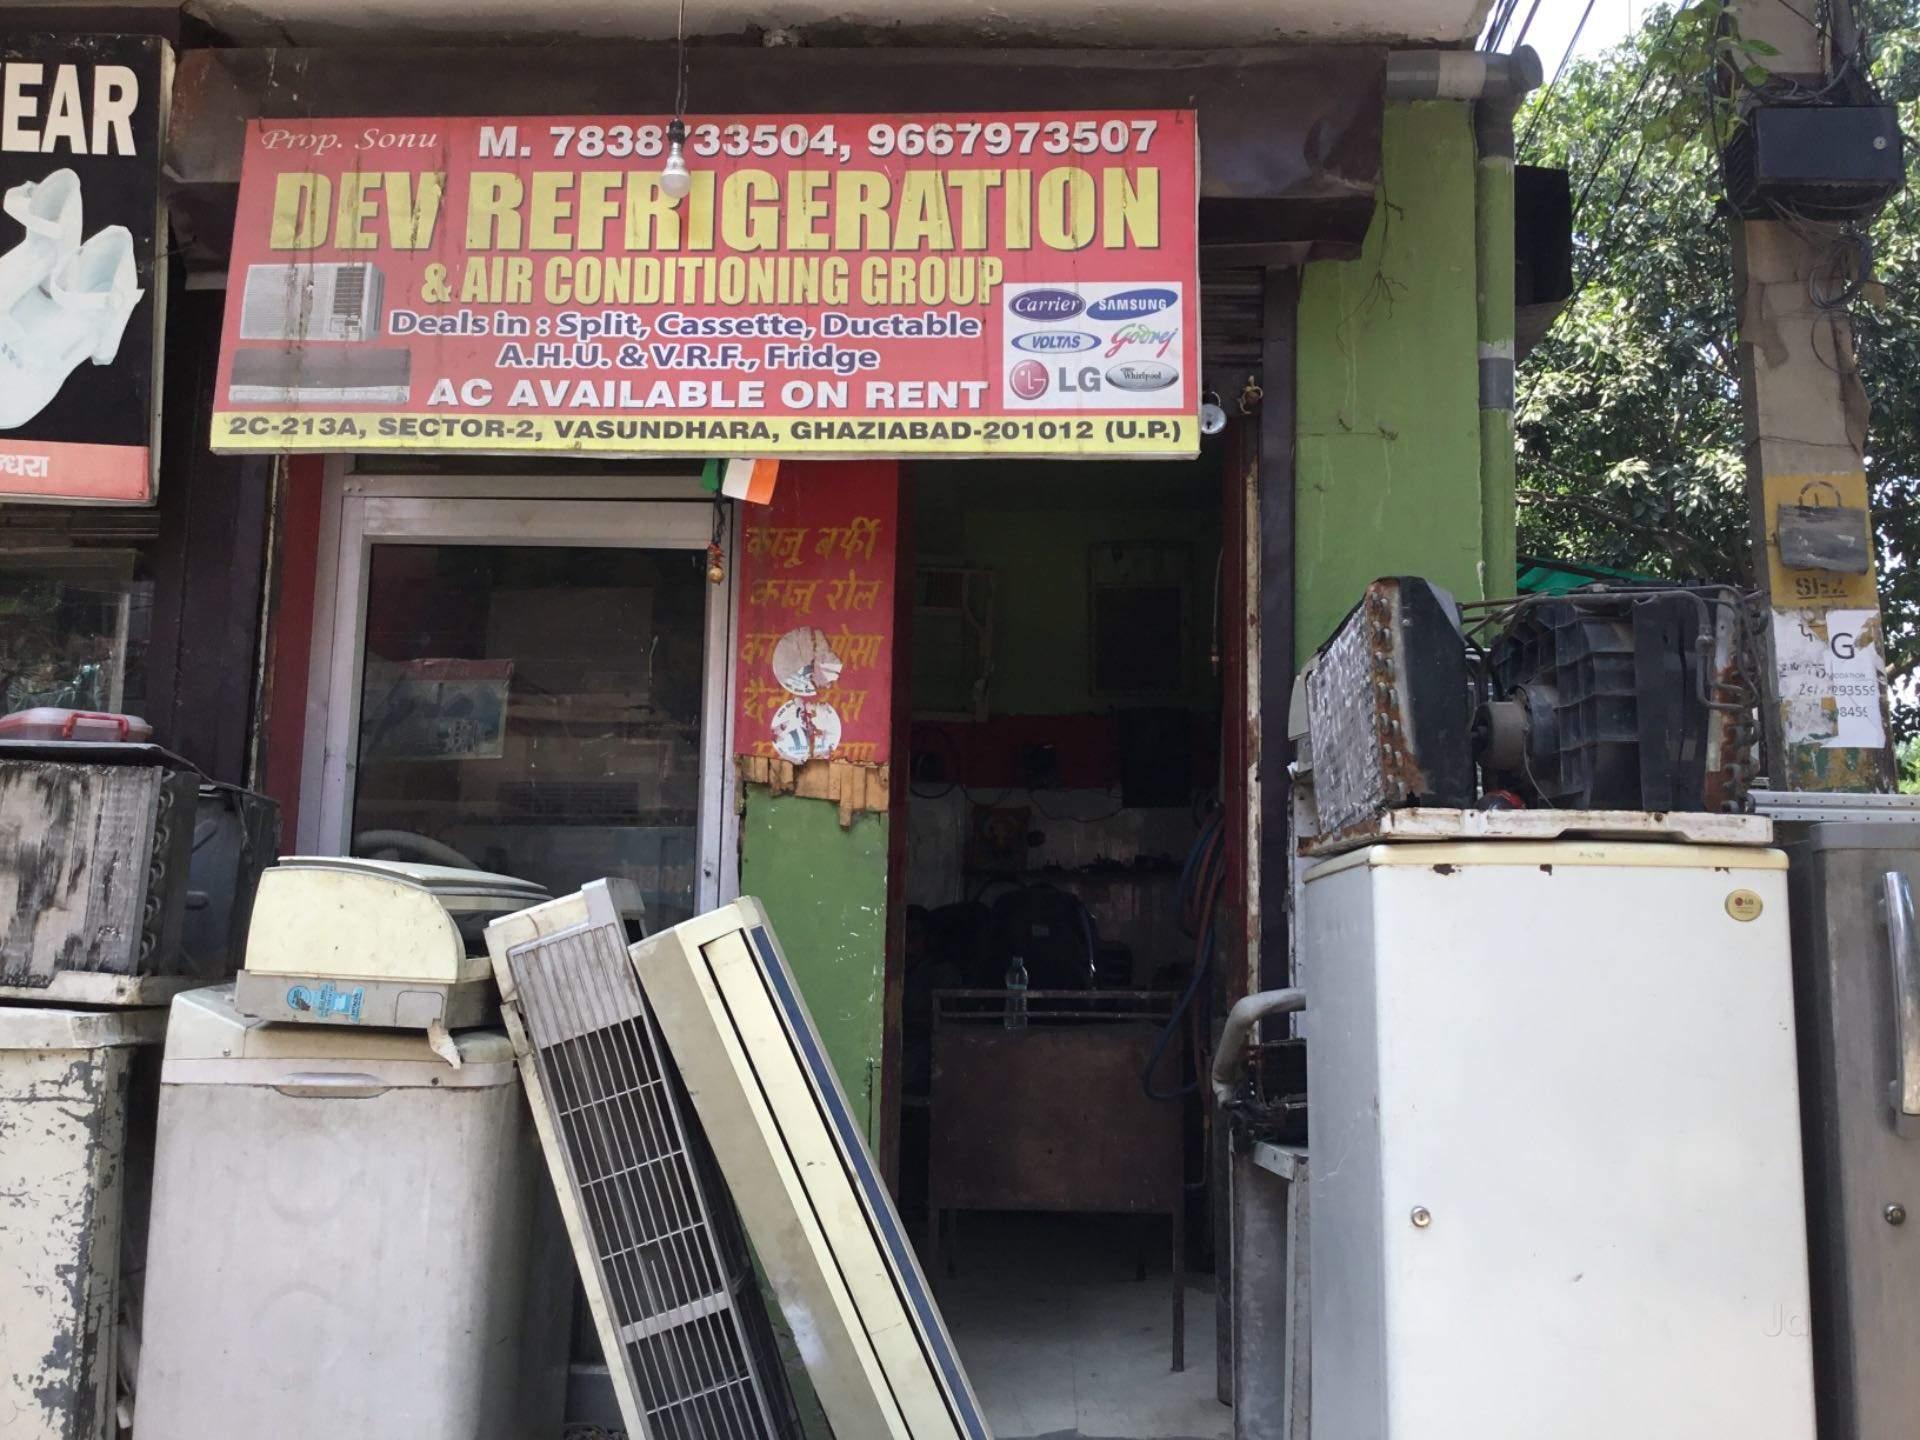 Top 100 Fridge Repair Services in Ahinsa Khand 1-Indirapuram